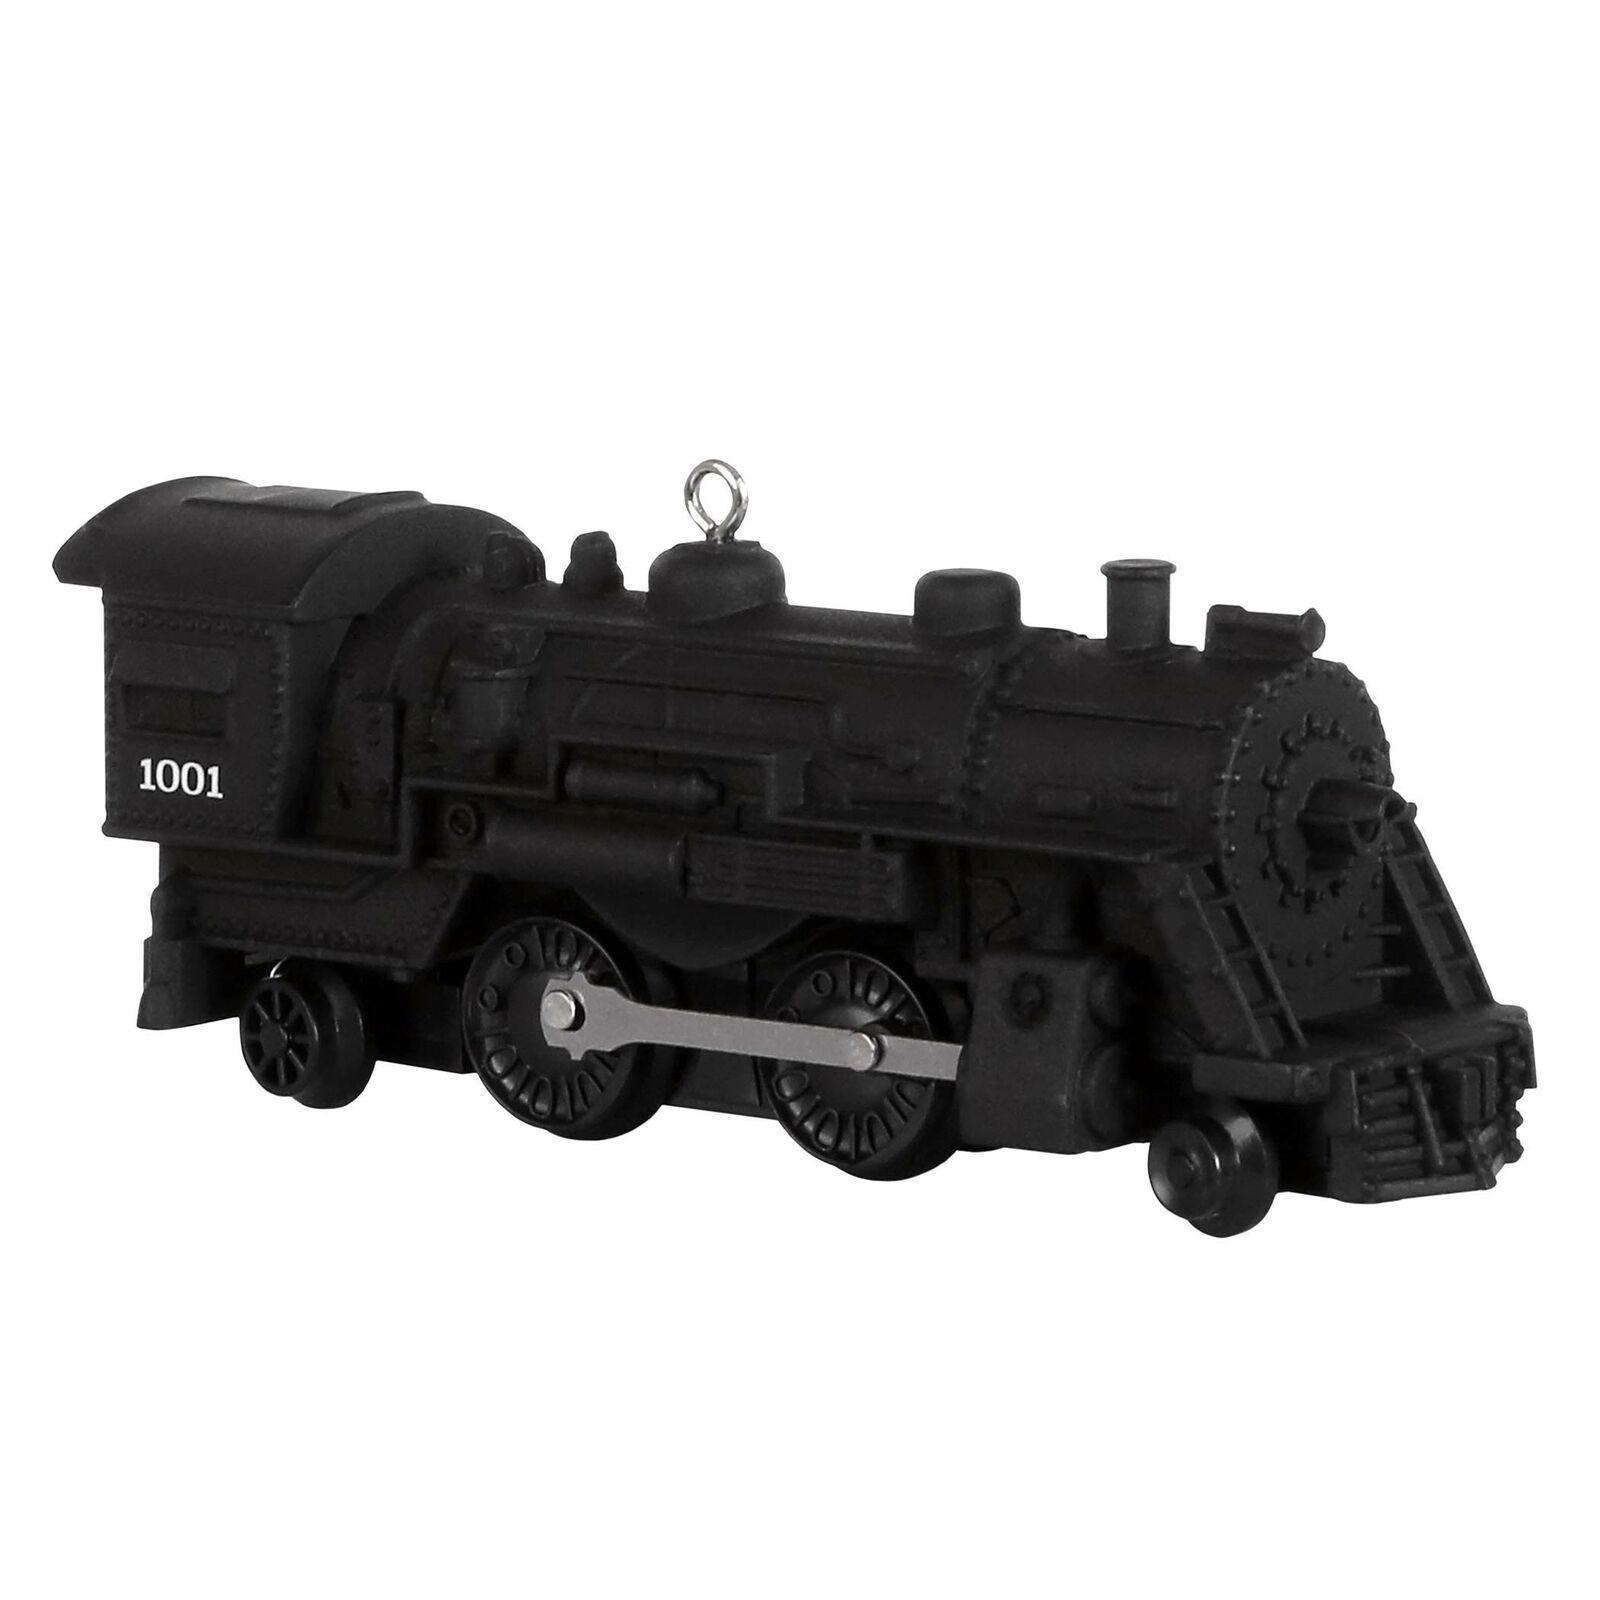 Hallmark Keepsake Christmas Ornament 2019 Year Dated Lionel Trains 1001 Scout... - $20.81